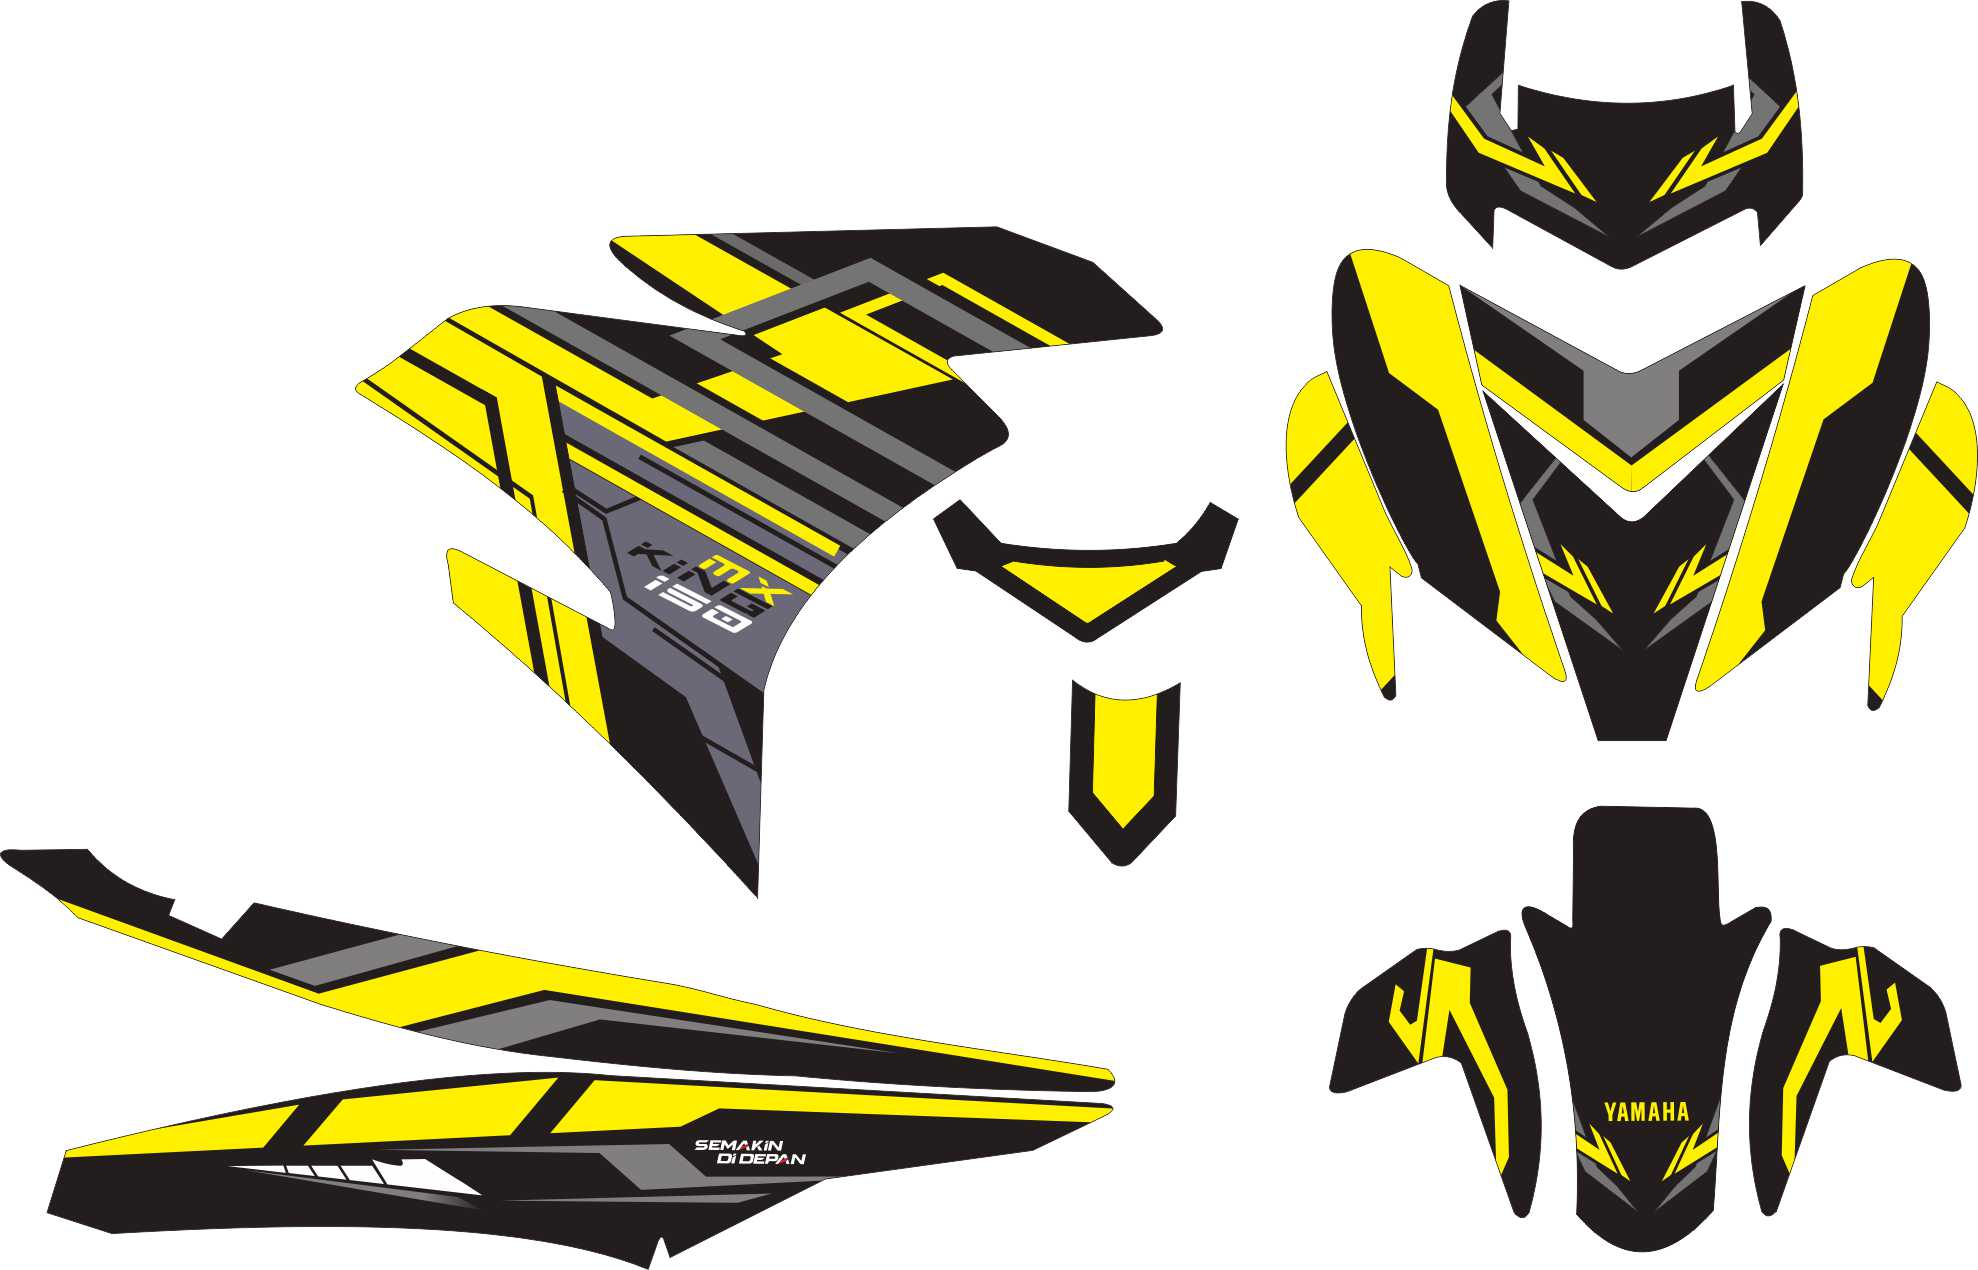 Beli stiker motor yamaha mx king 150 hi tech grade s